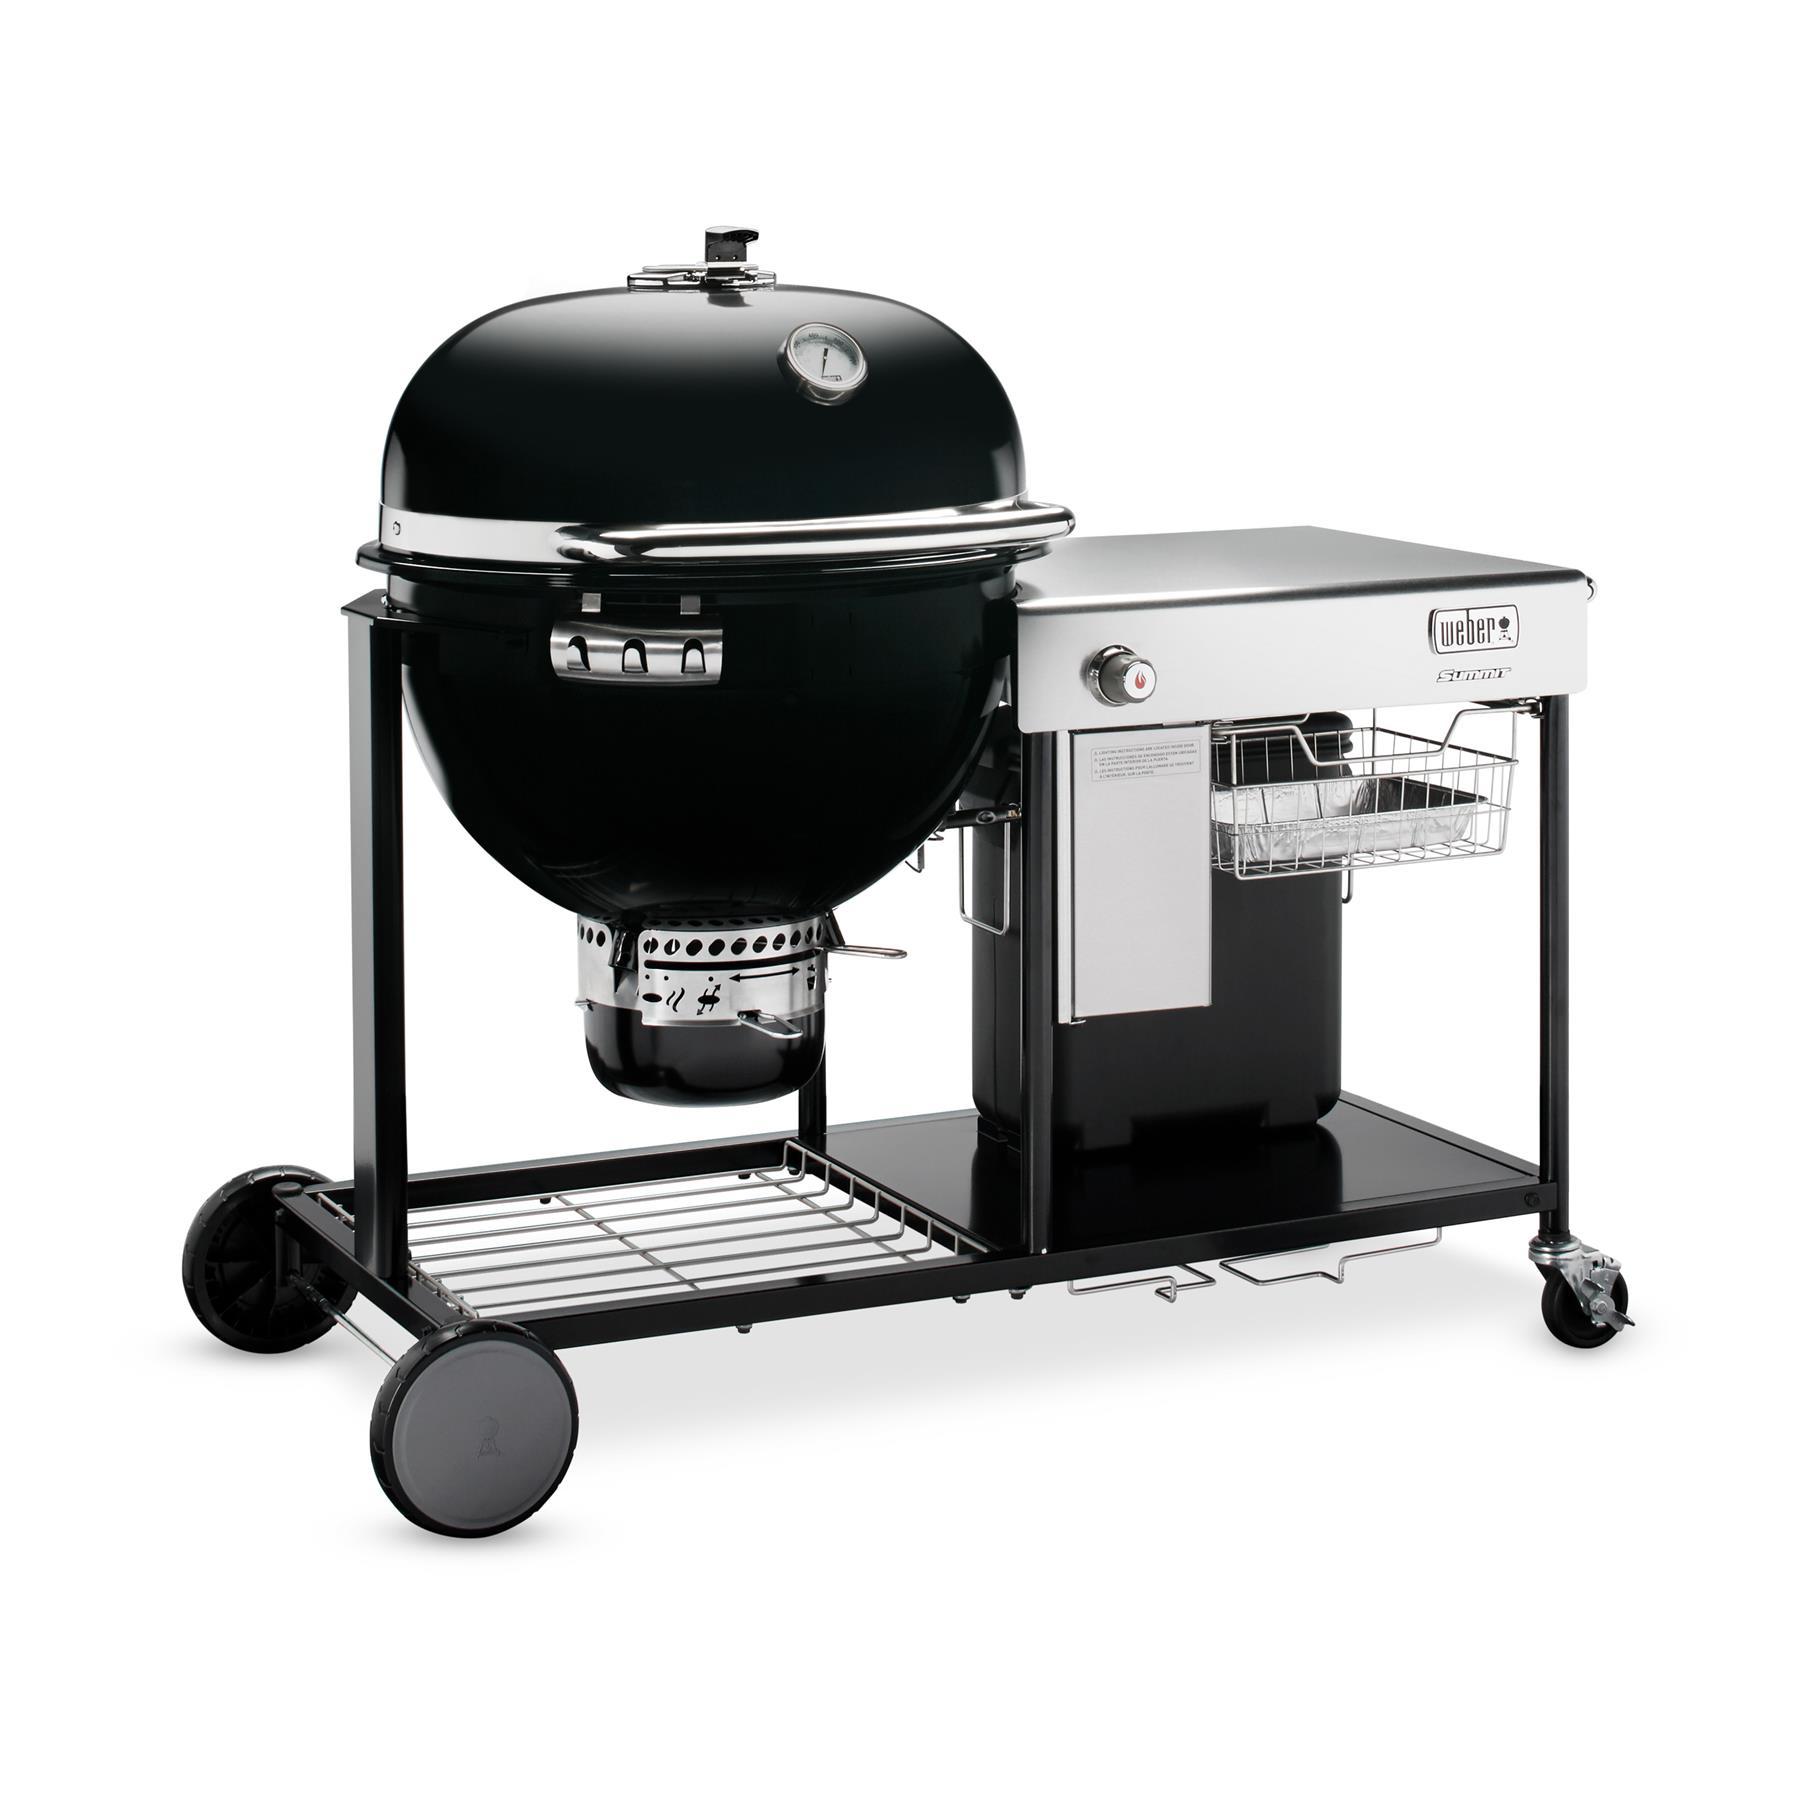 Weber Summit Grilling Center Houtskoolbarbecue kopen? shop